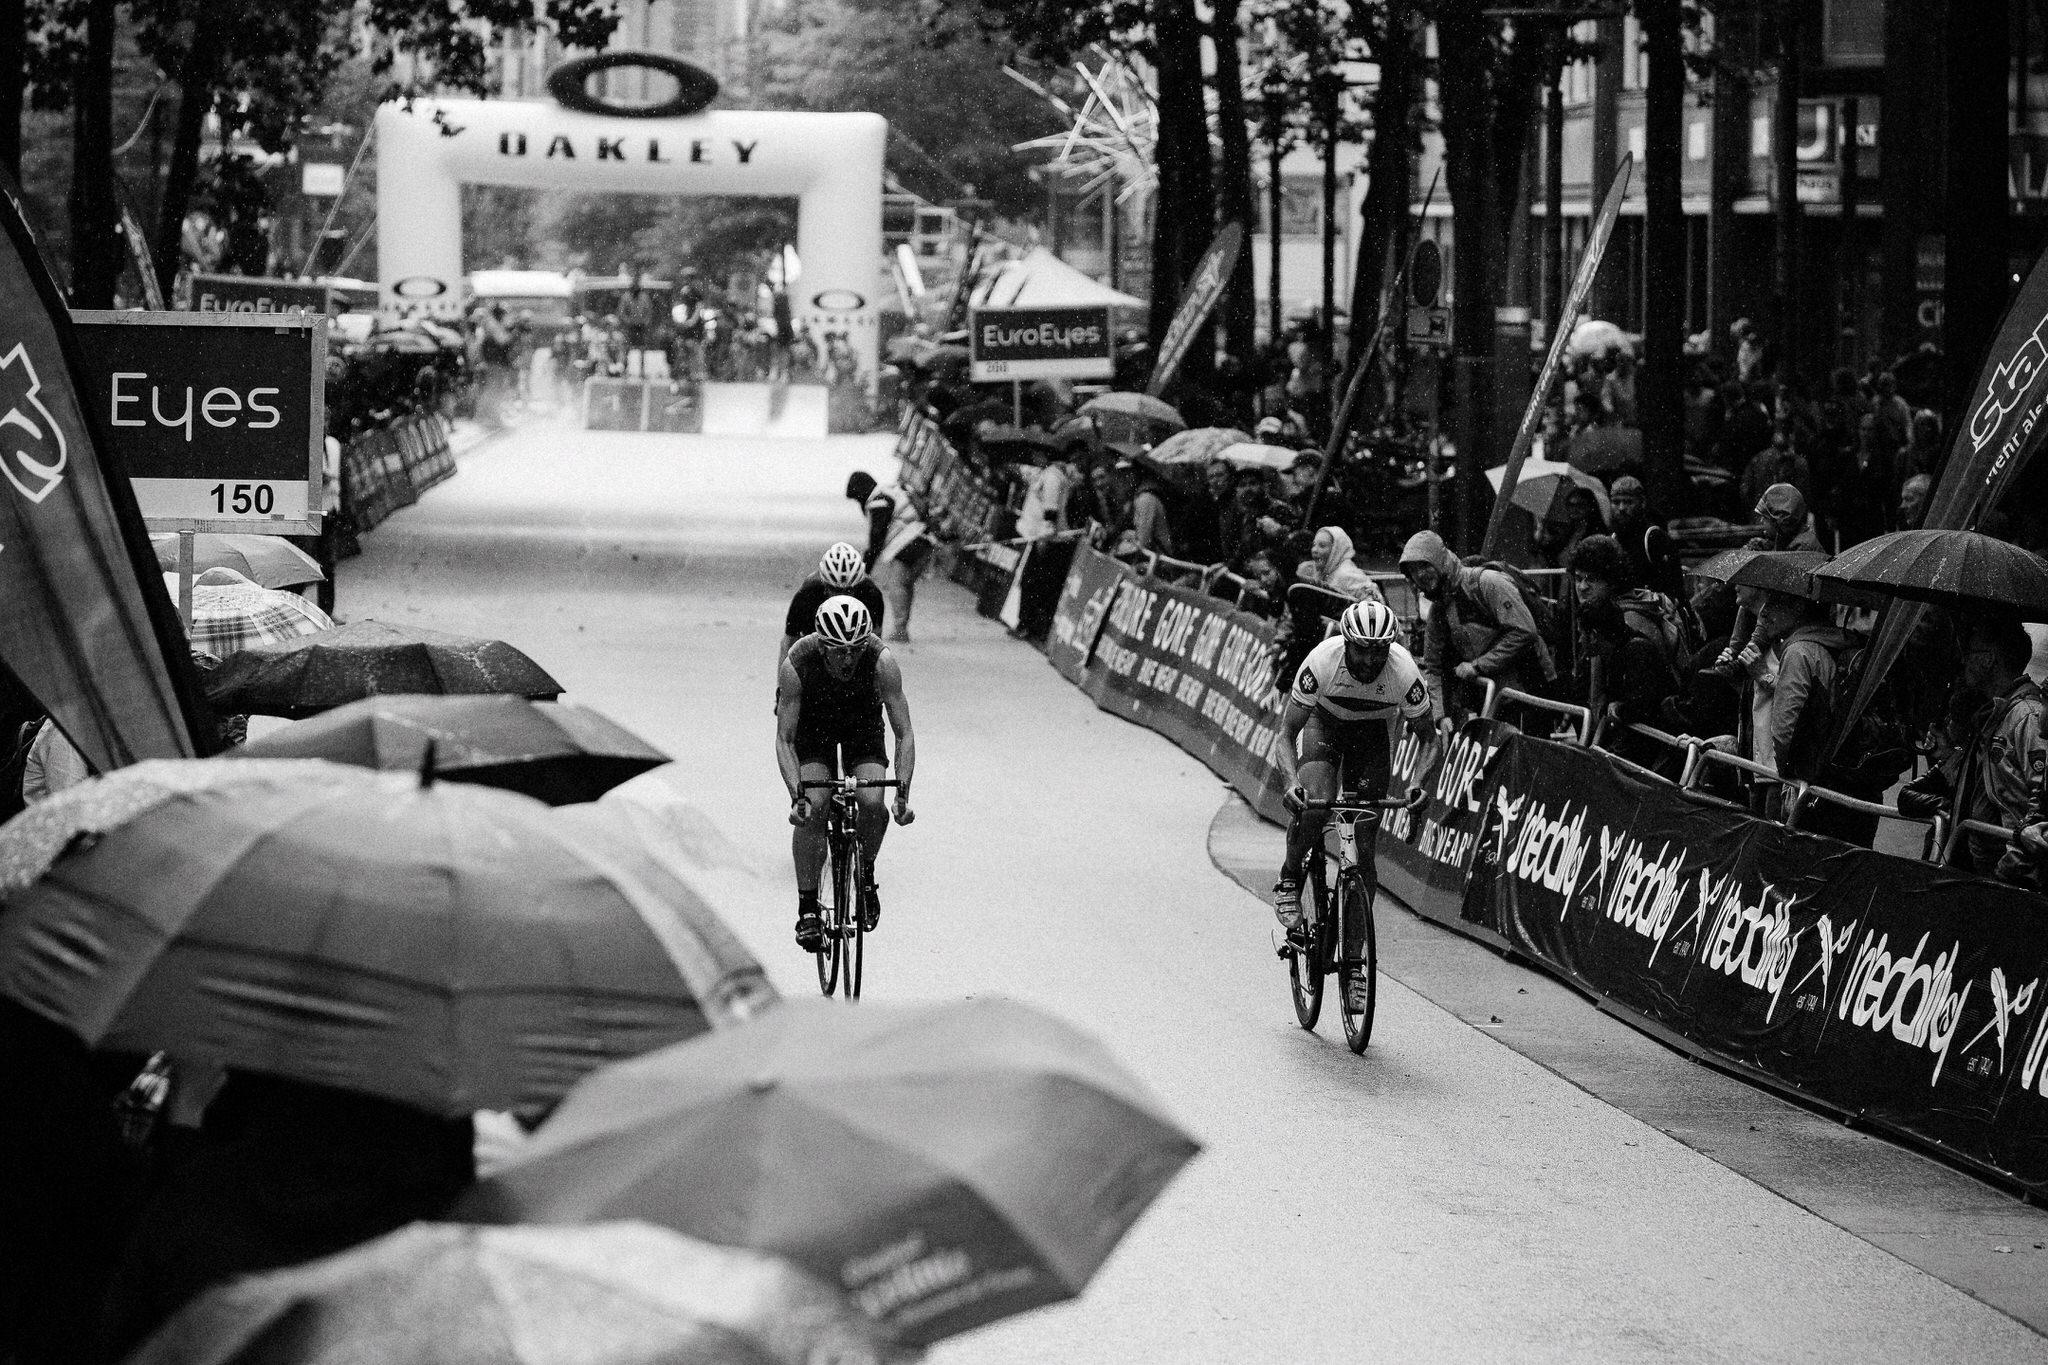 RAD-RACE_BATTLE_Cyclassics_2017_Photo by Björn Lexius_10.jpg